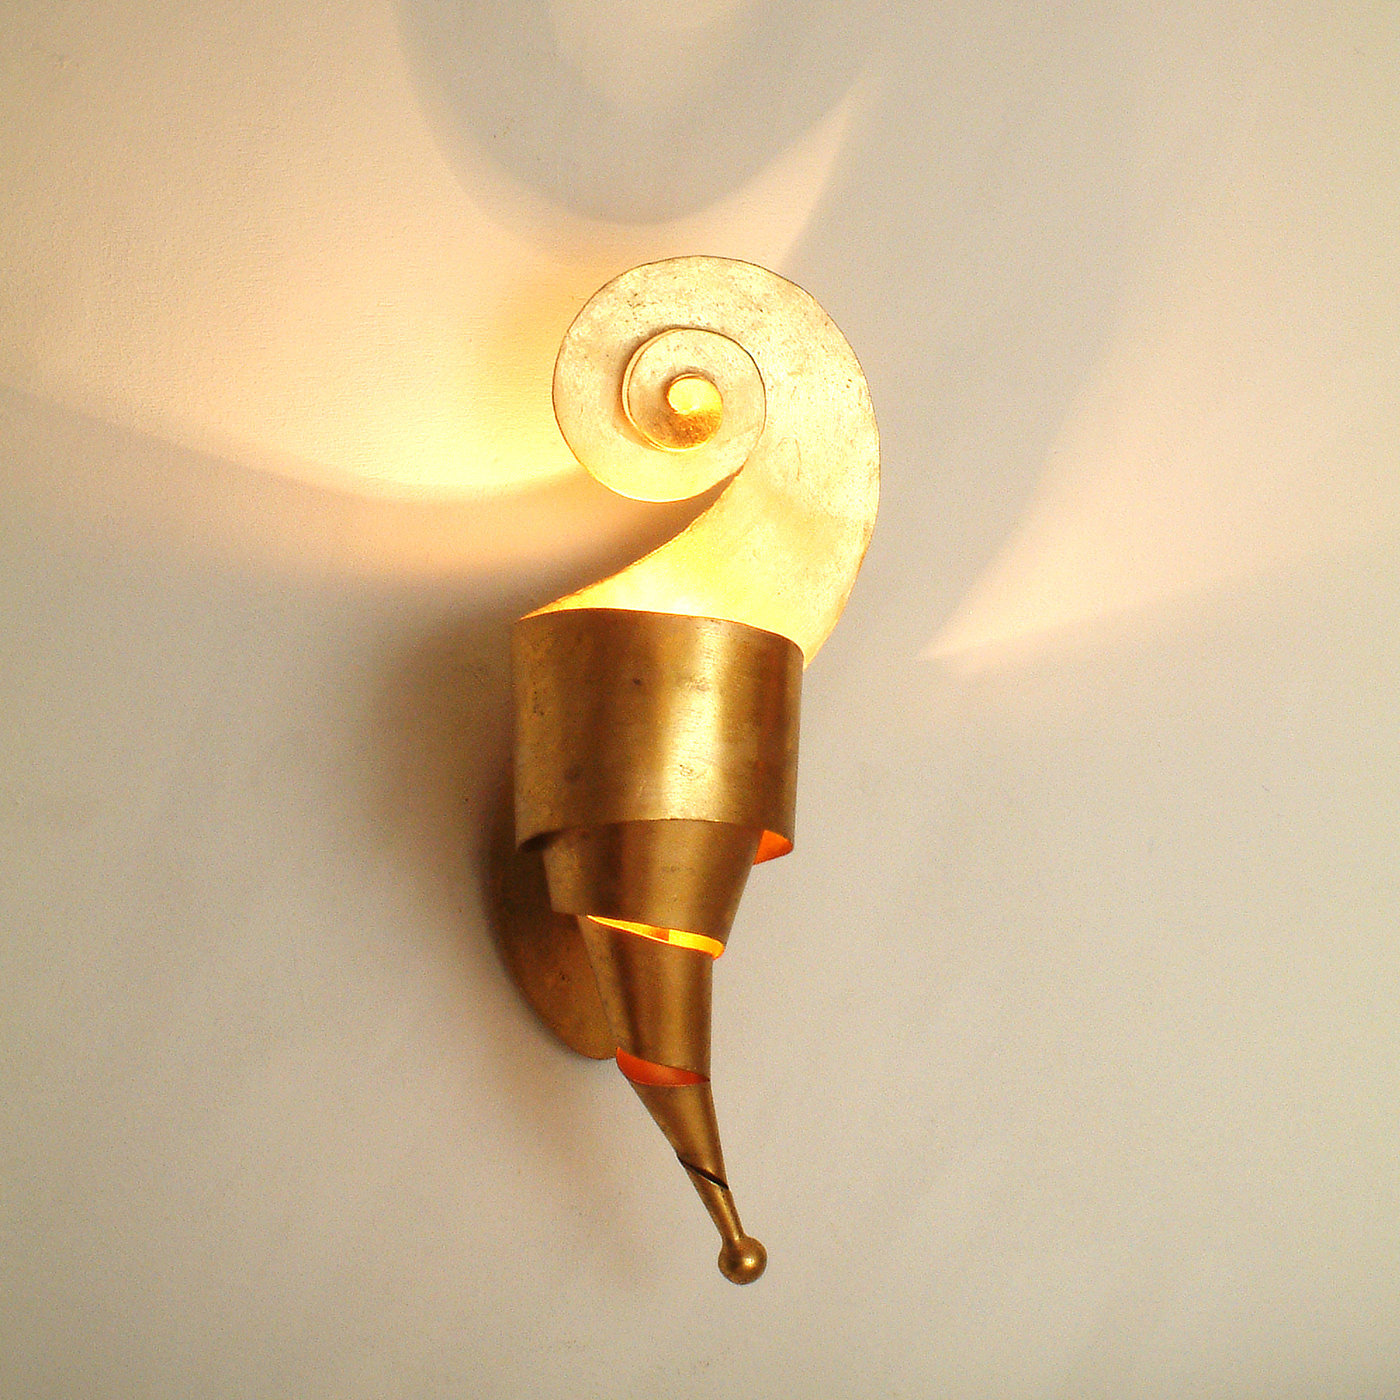 Innovazione Rechts Gold Wandleuchte